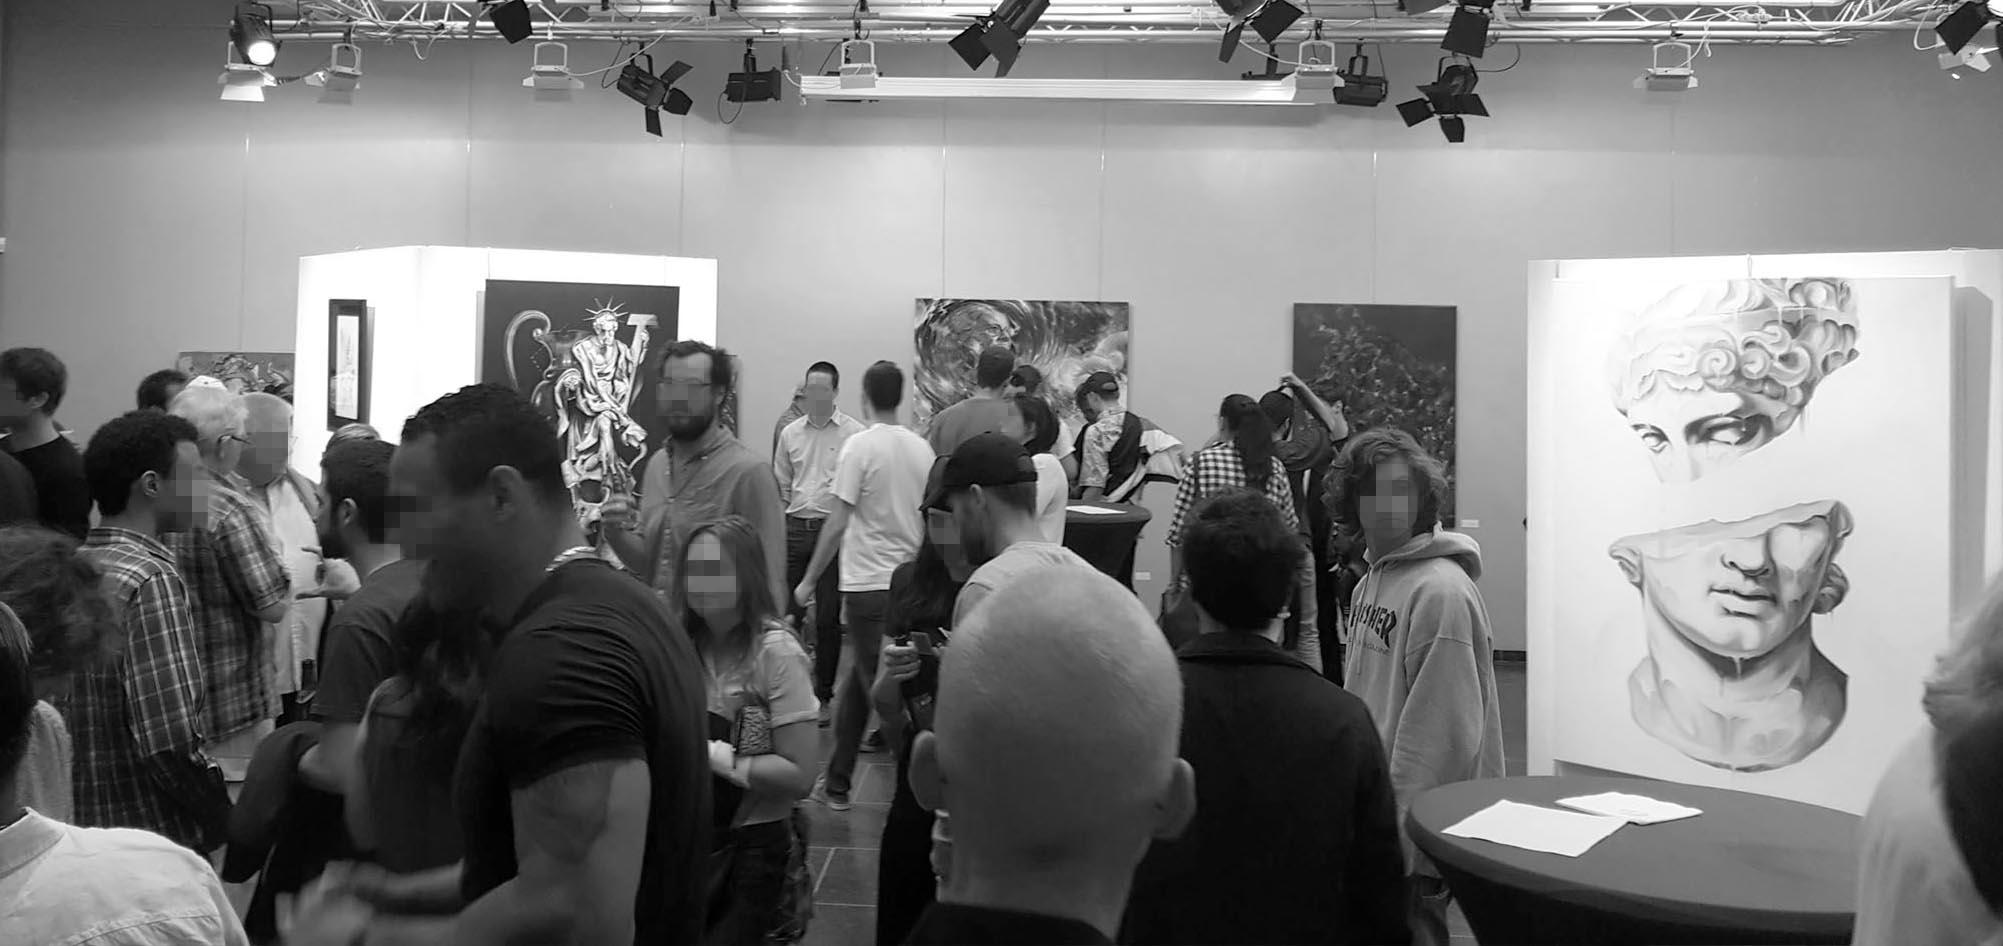 https://www.propaganza.be/wp-content/uploads/2015/09/propaganza-urban-artist-graffiti-graff-street-art-spray-painting-belgique-vapors-expo-exhibition-uccle-ccu-2017-2.jpg